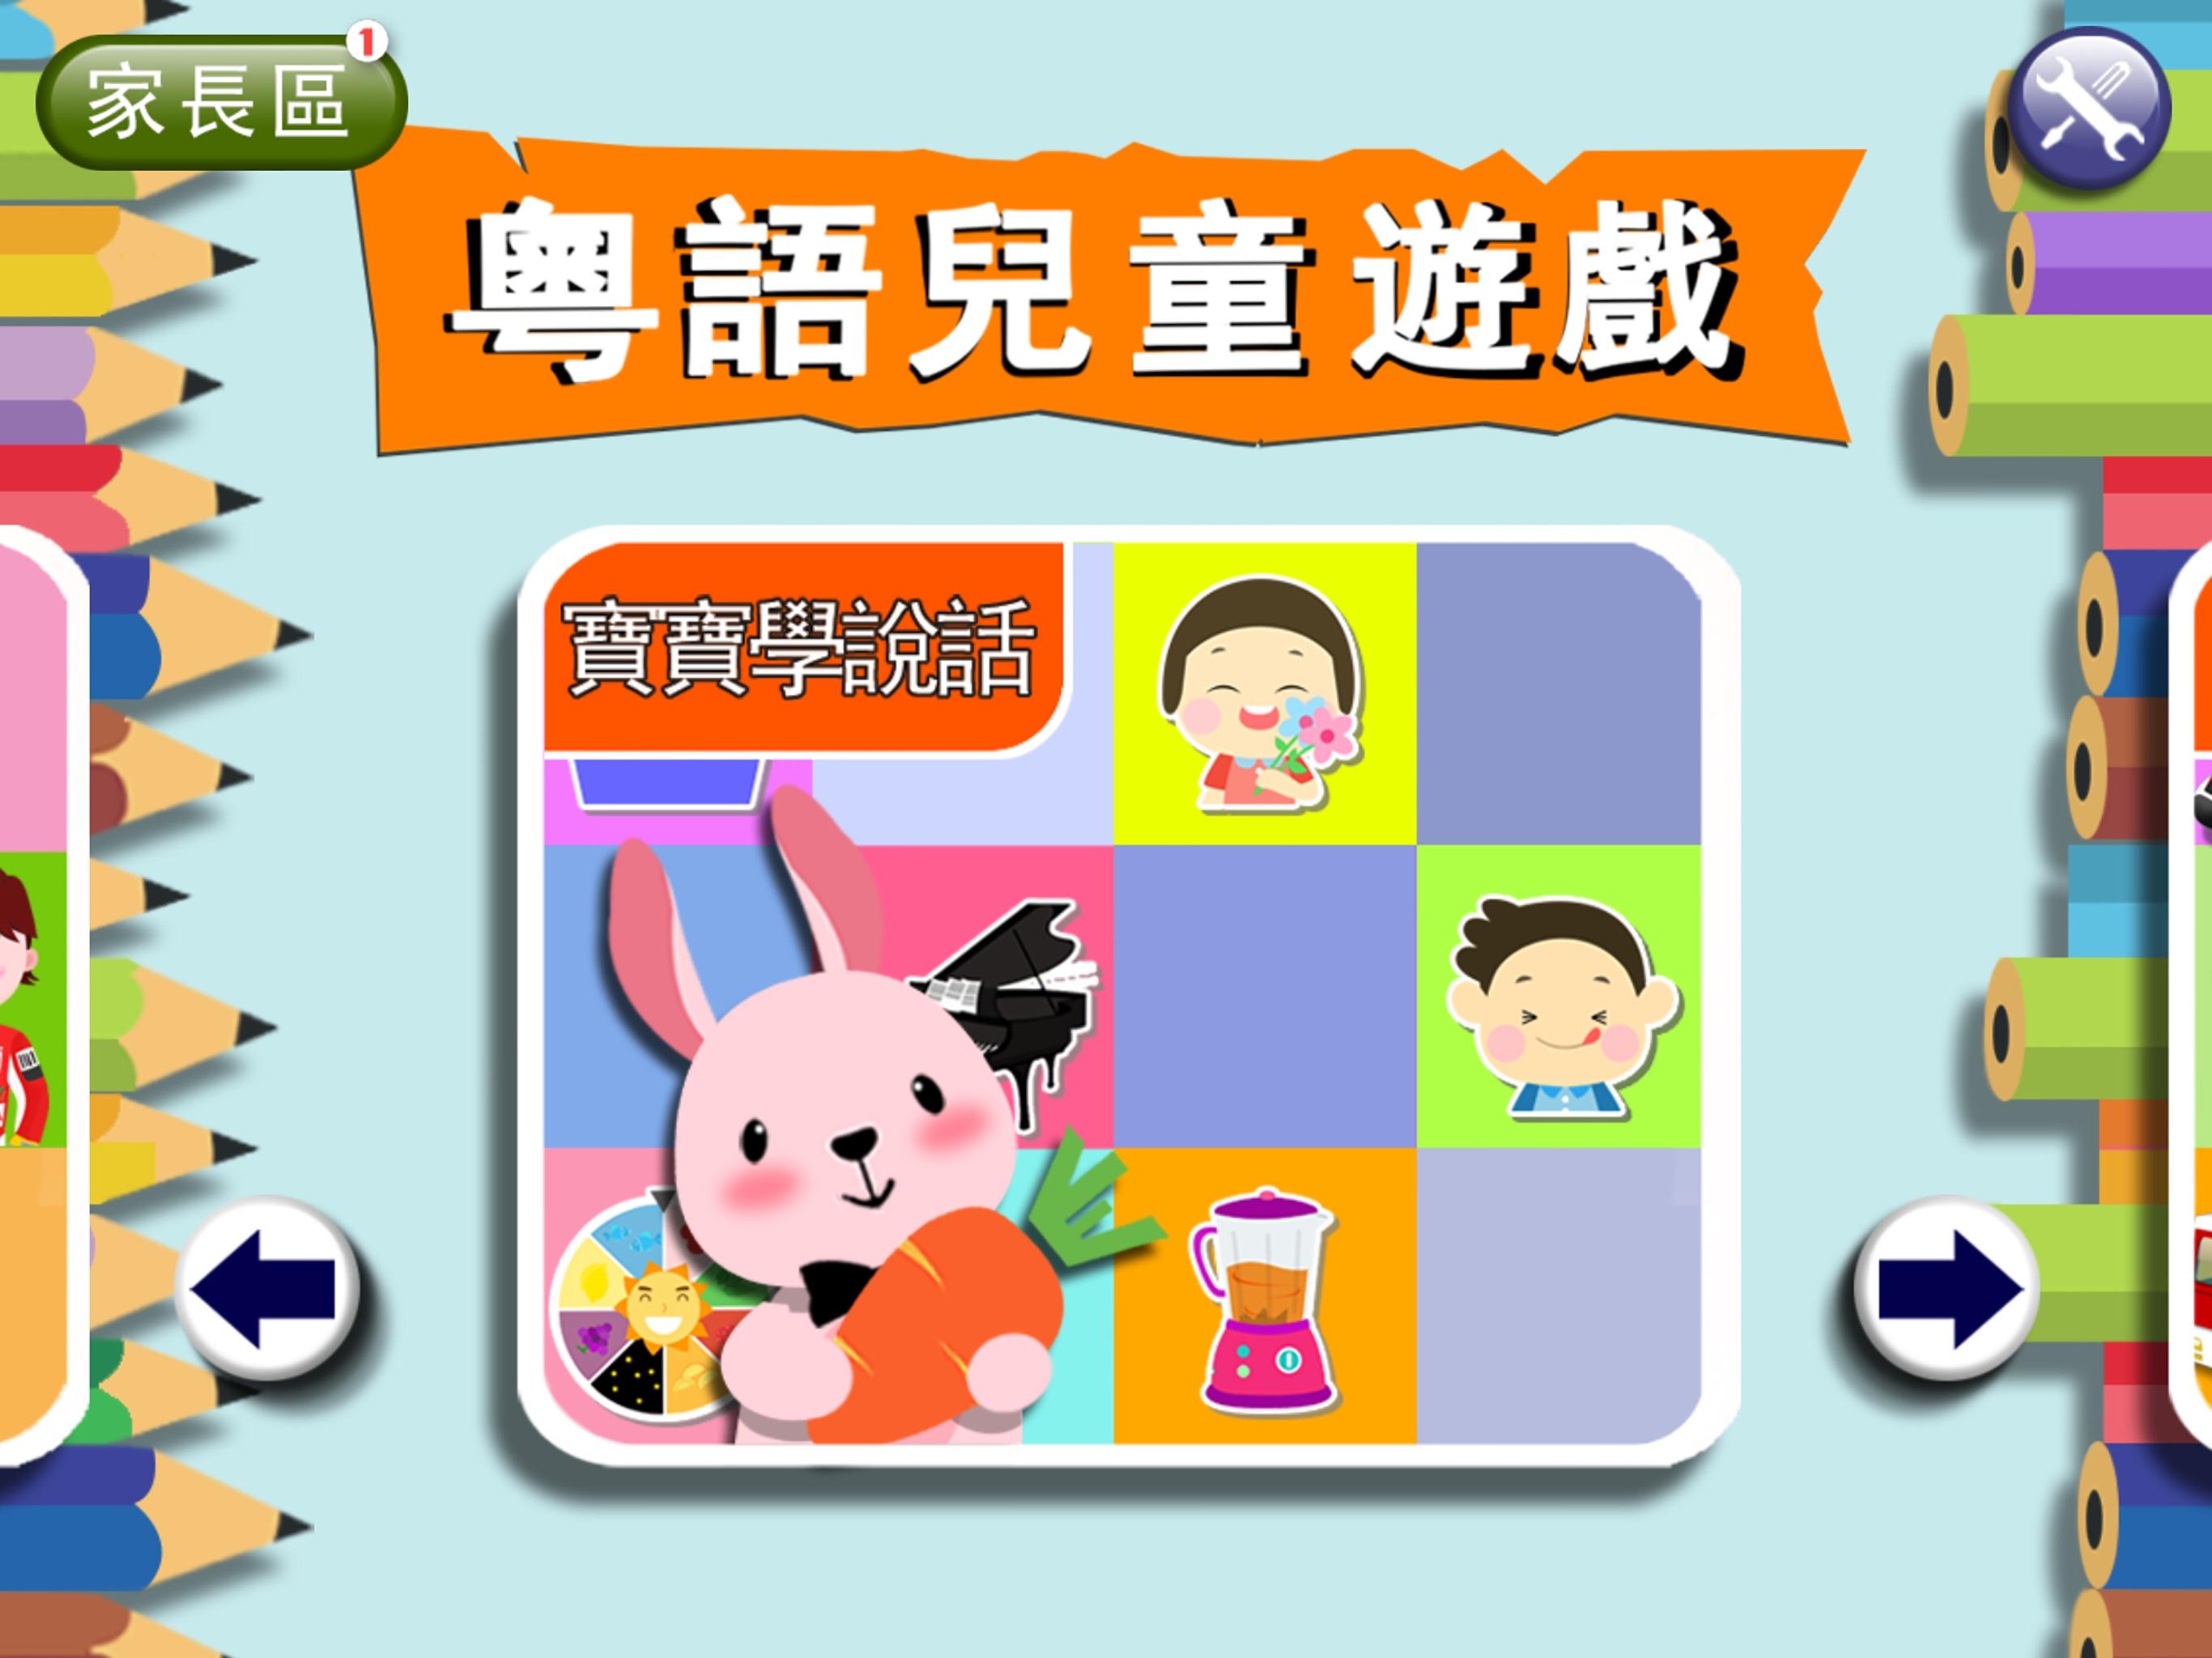 Cantonese Game For Kids-粤语儿童游戏-粵語兒童遊戲